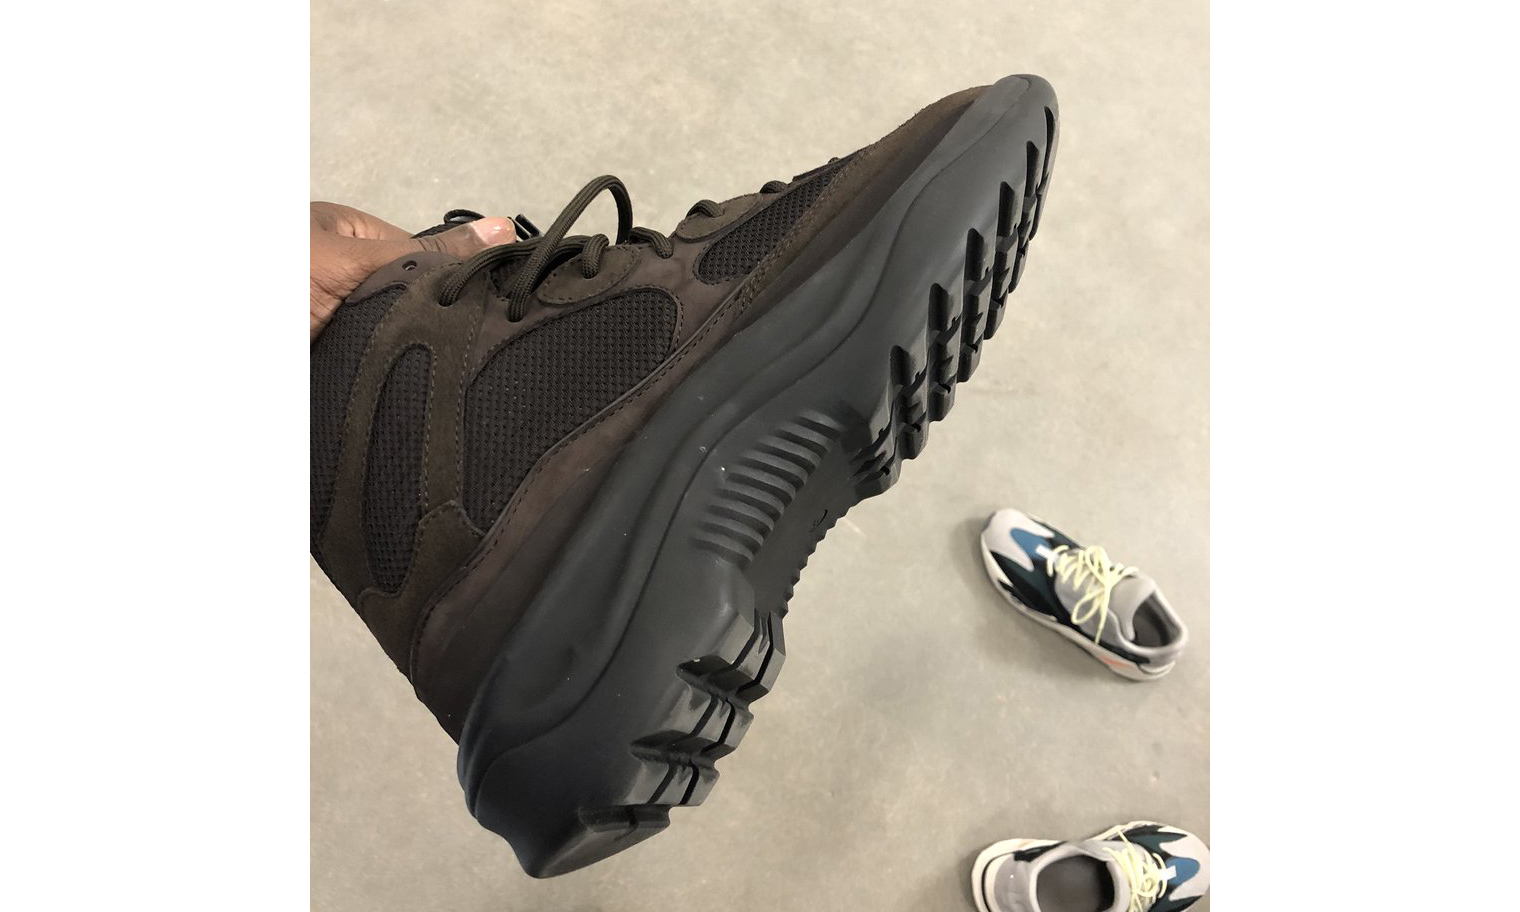 Kanye West 花了六个月重新设计 Rat Boot